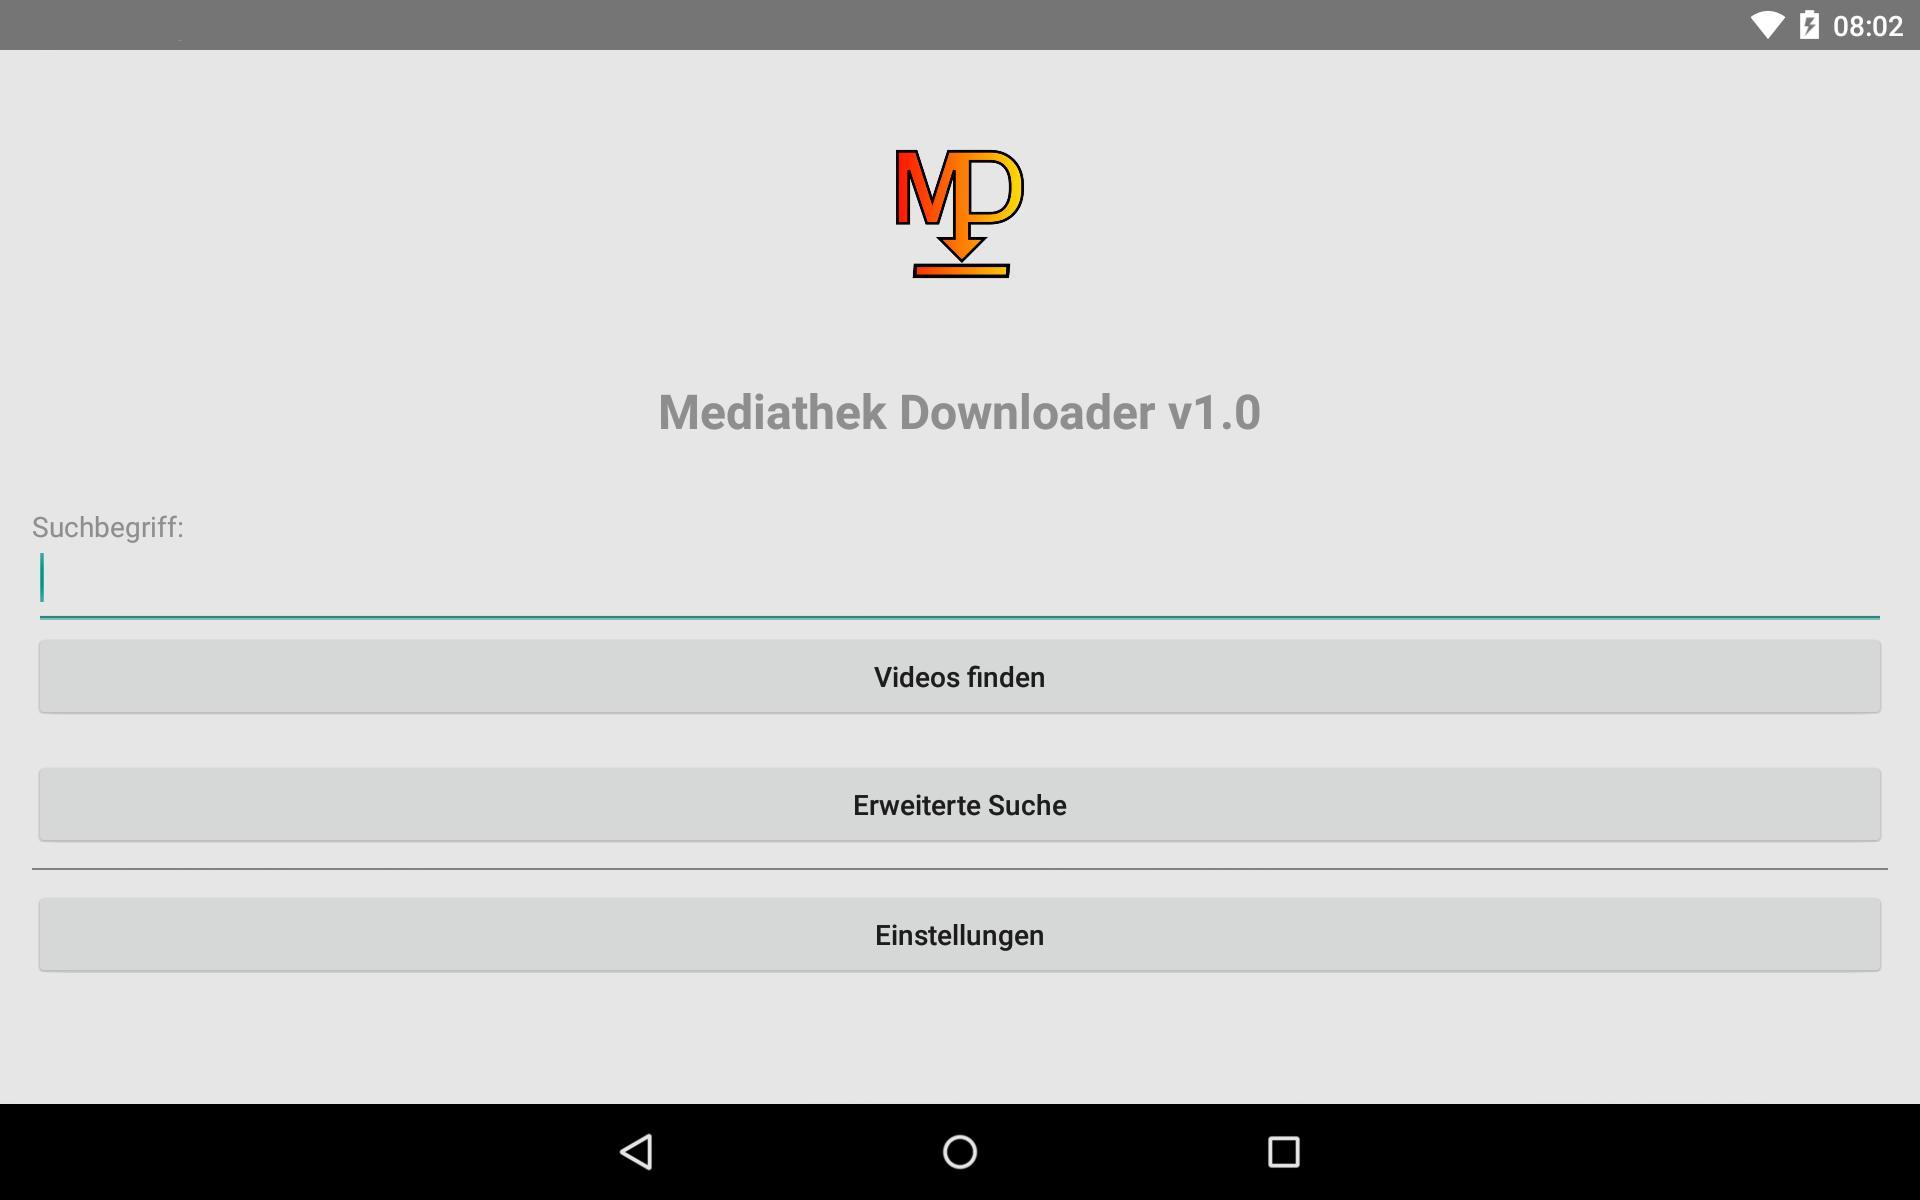 Mediathk